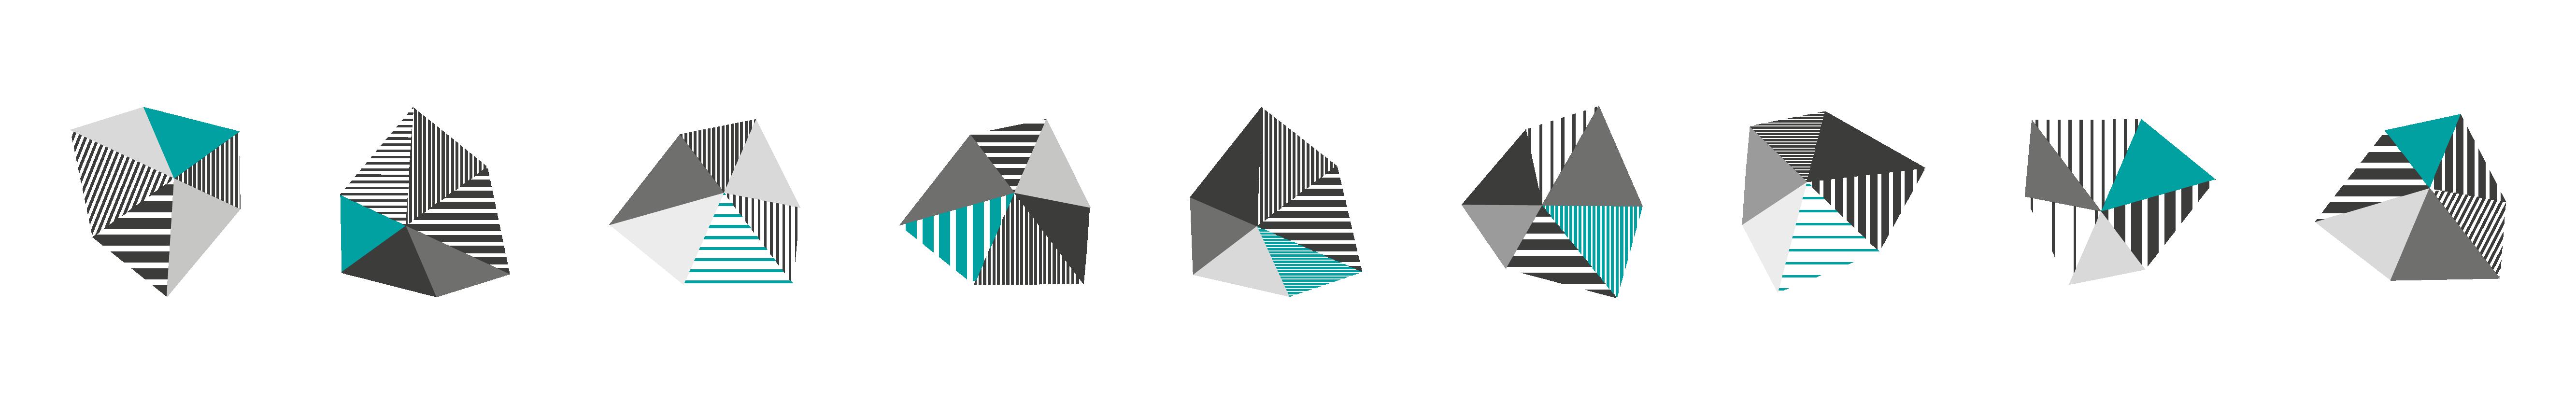 atremaa-lgz-pattern2